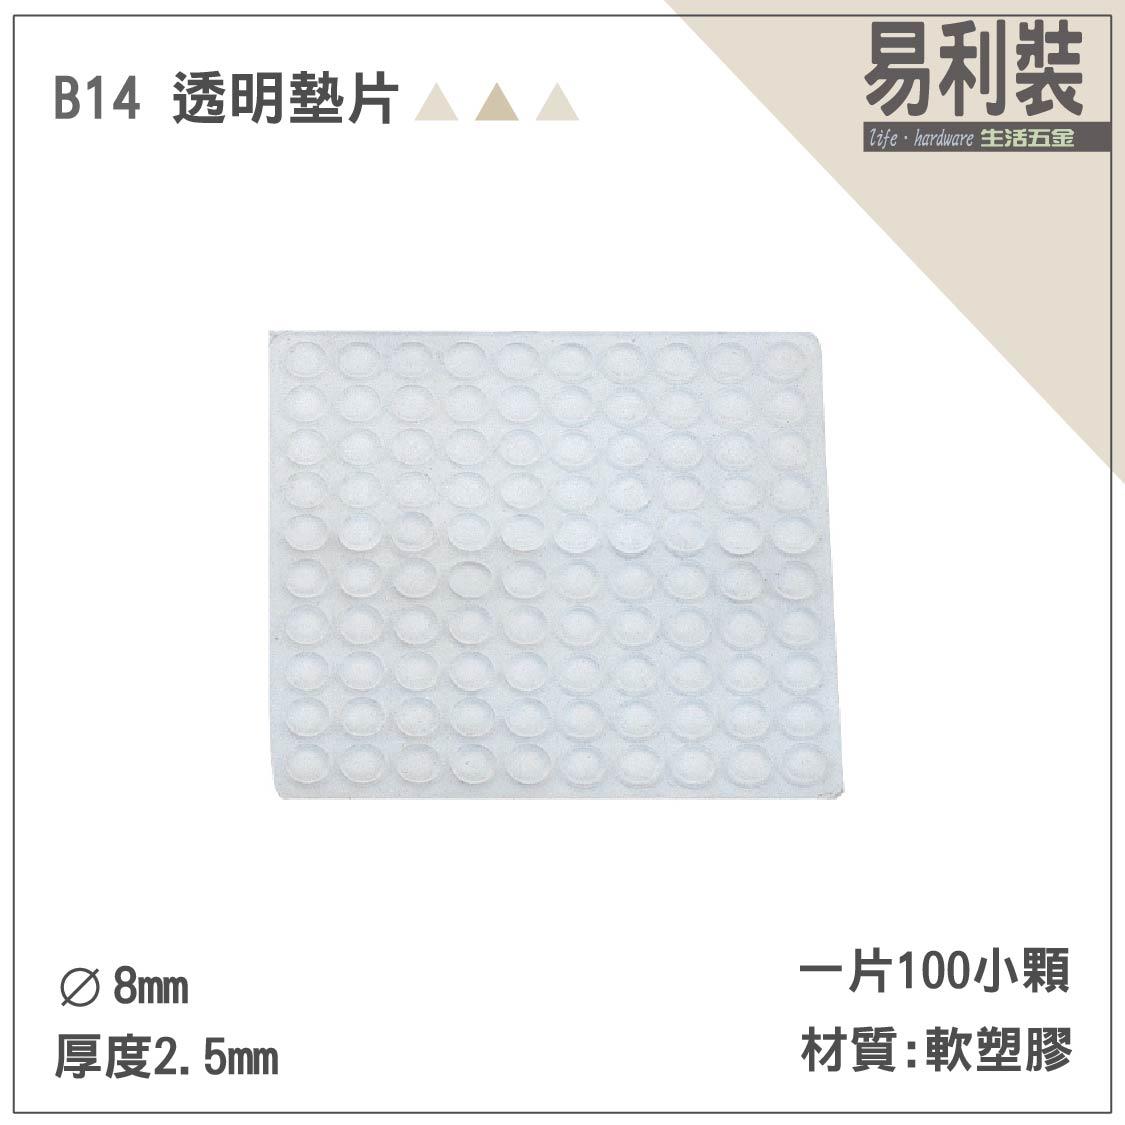 【 EASYCAN  】B14 透明墊片 1片100顆 易利裝生活五金 浴室 廚房 房間 臥房 衣櫃 小資族 辦公家具 系統家具 0